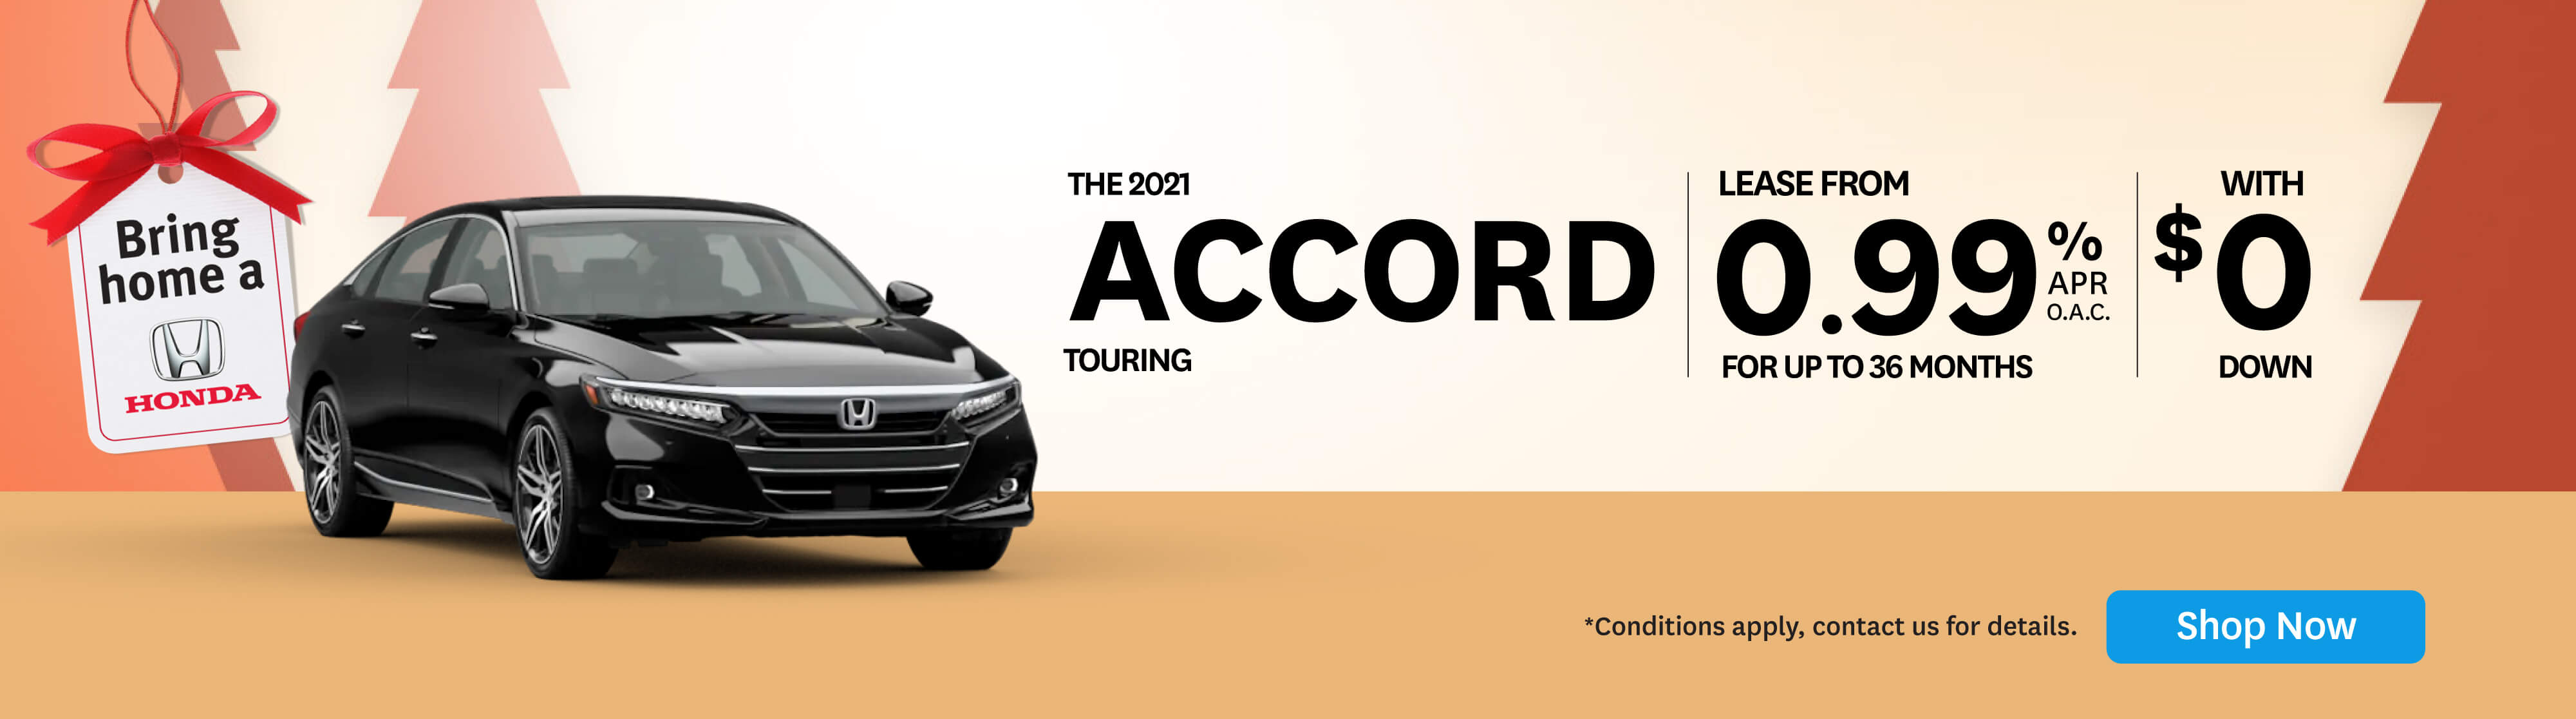 Honda CR-V 2021 Model Clearout